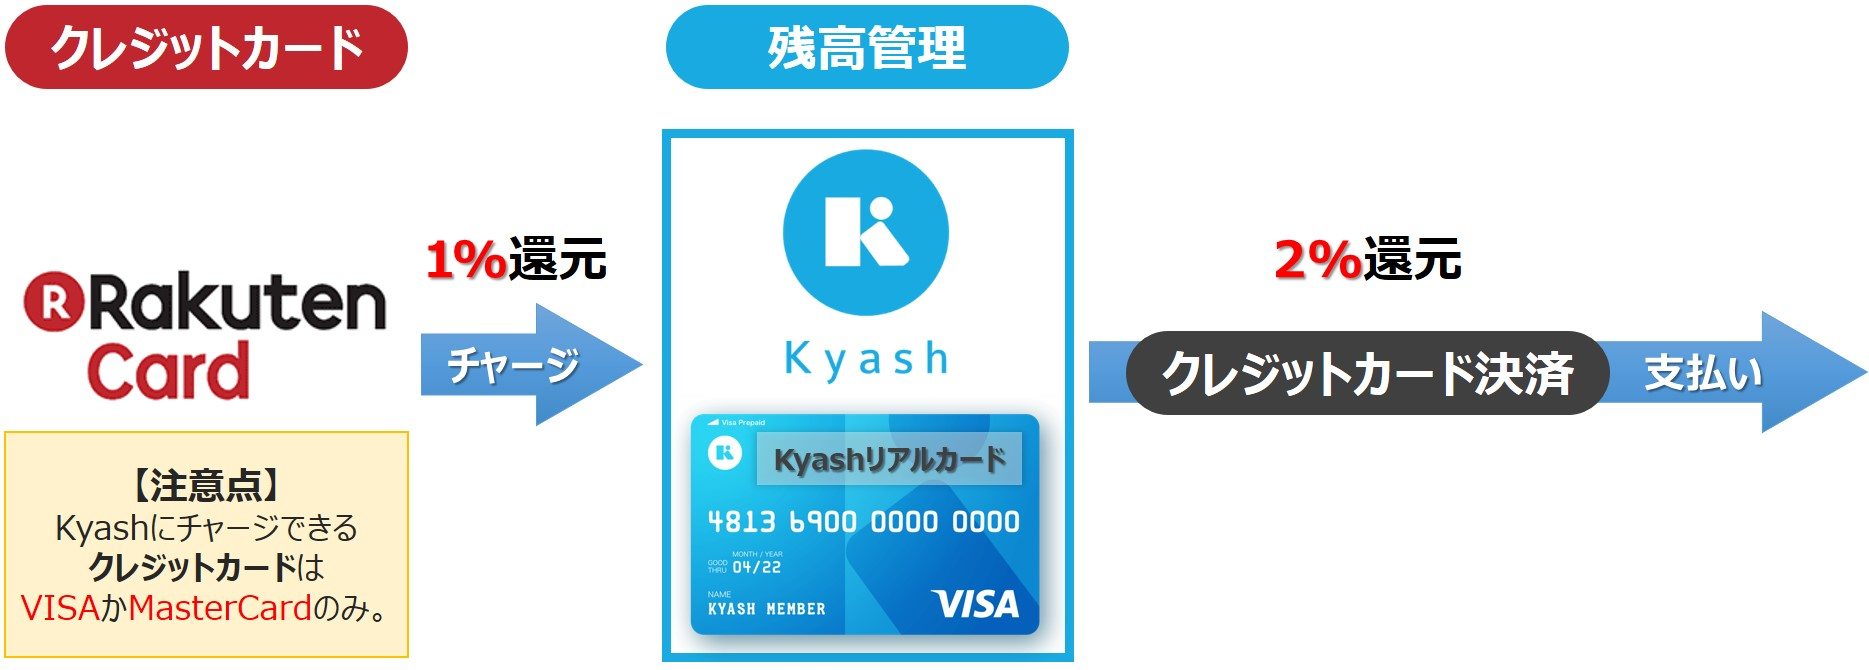 Kyashを使った還元率を3%にする方法